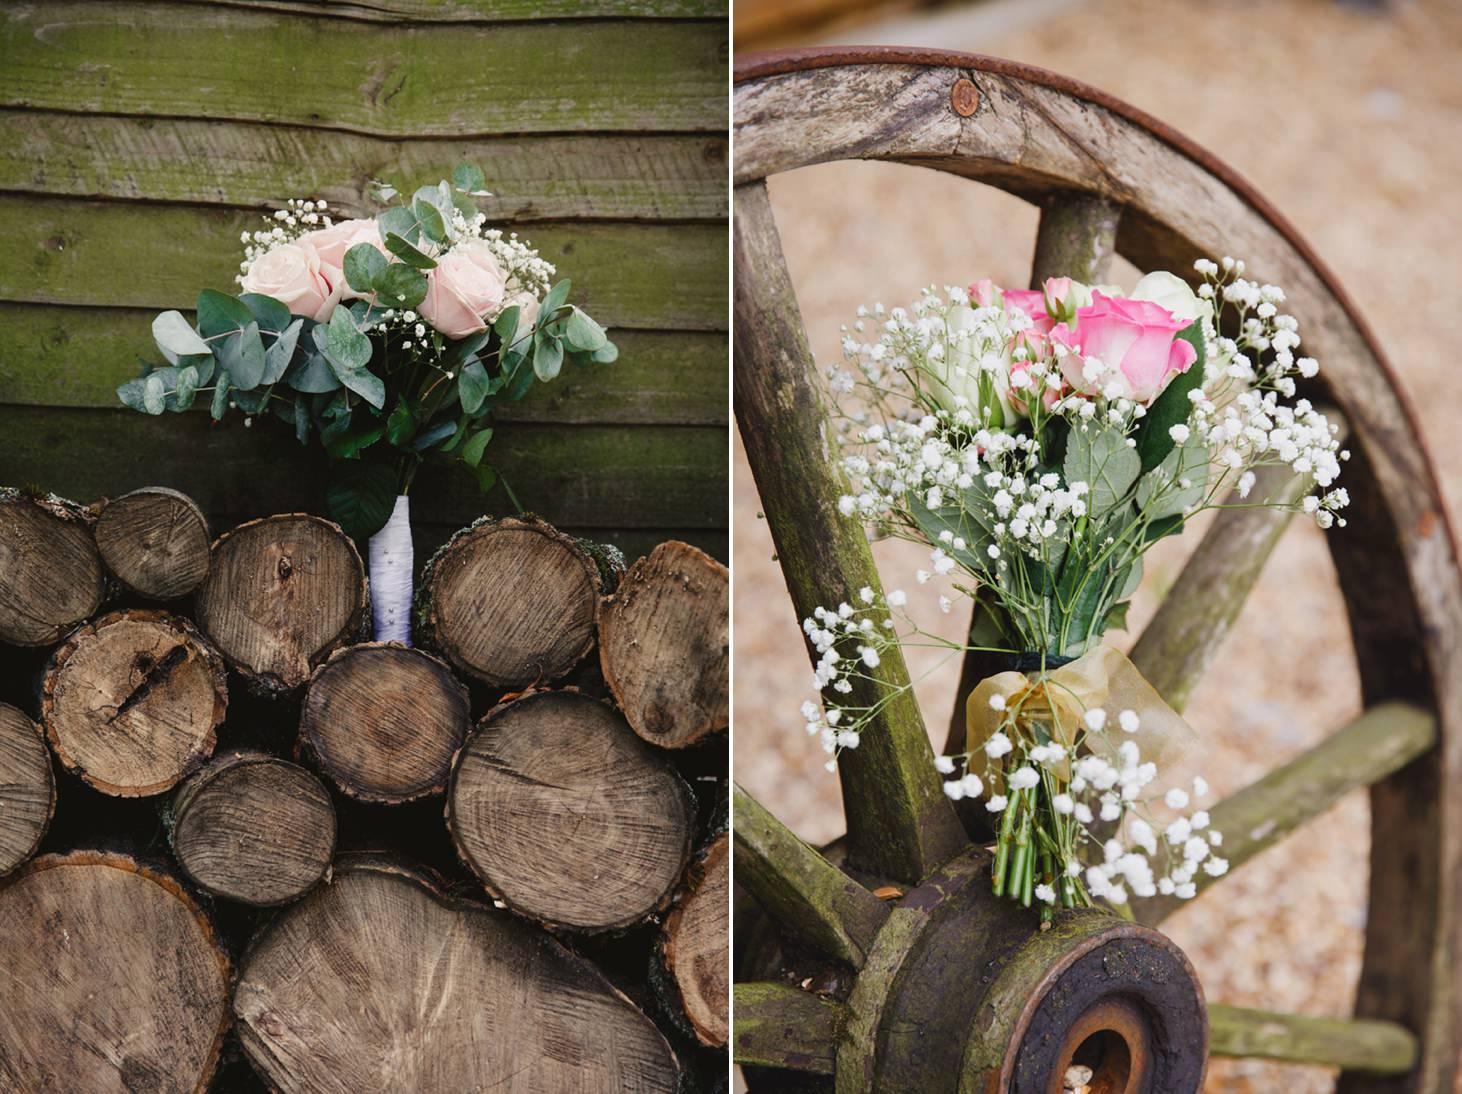 Bodleian library wedding bouquet details